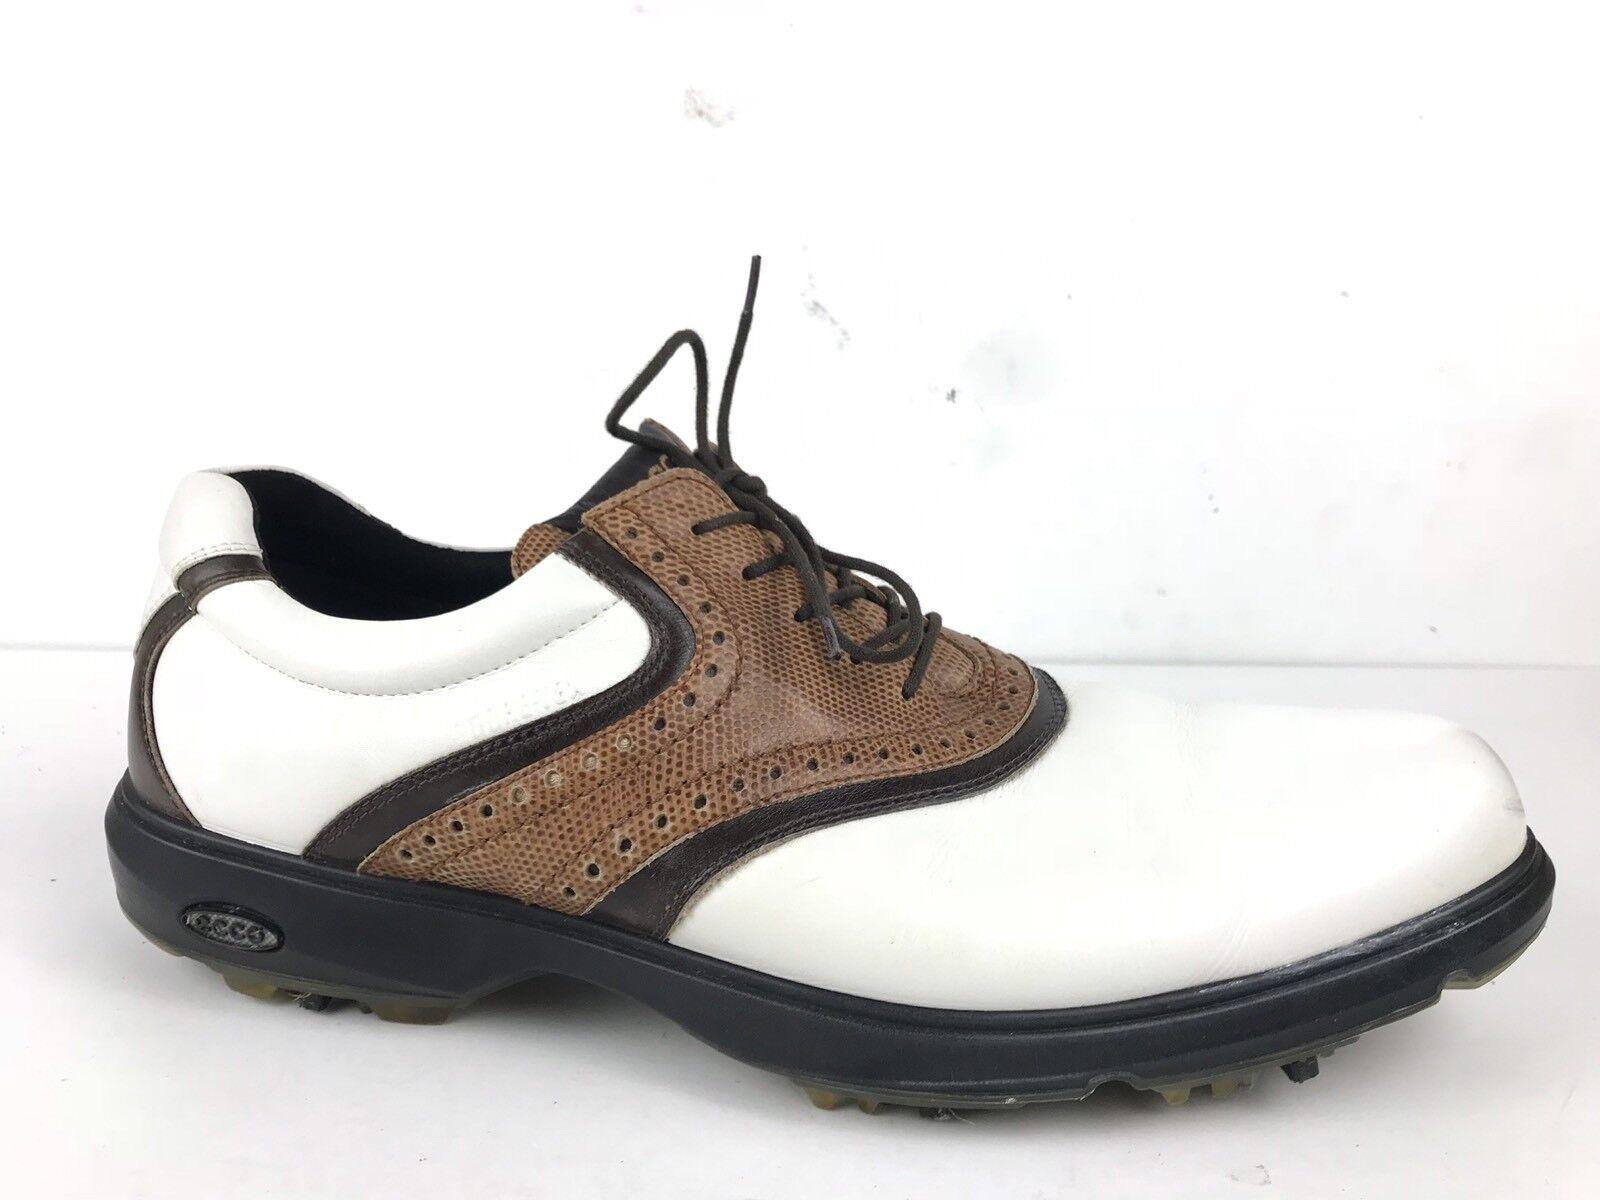 Ecco Classic GTX Gore-Tex Waterproof Golf Scarpe Saddle marrone/White marrone/White marrone/White Uomo 47/13 7710ba